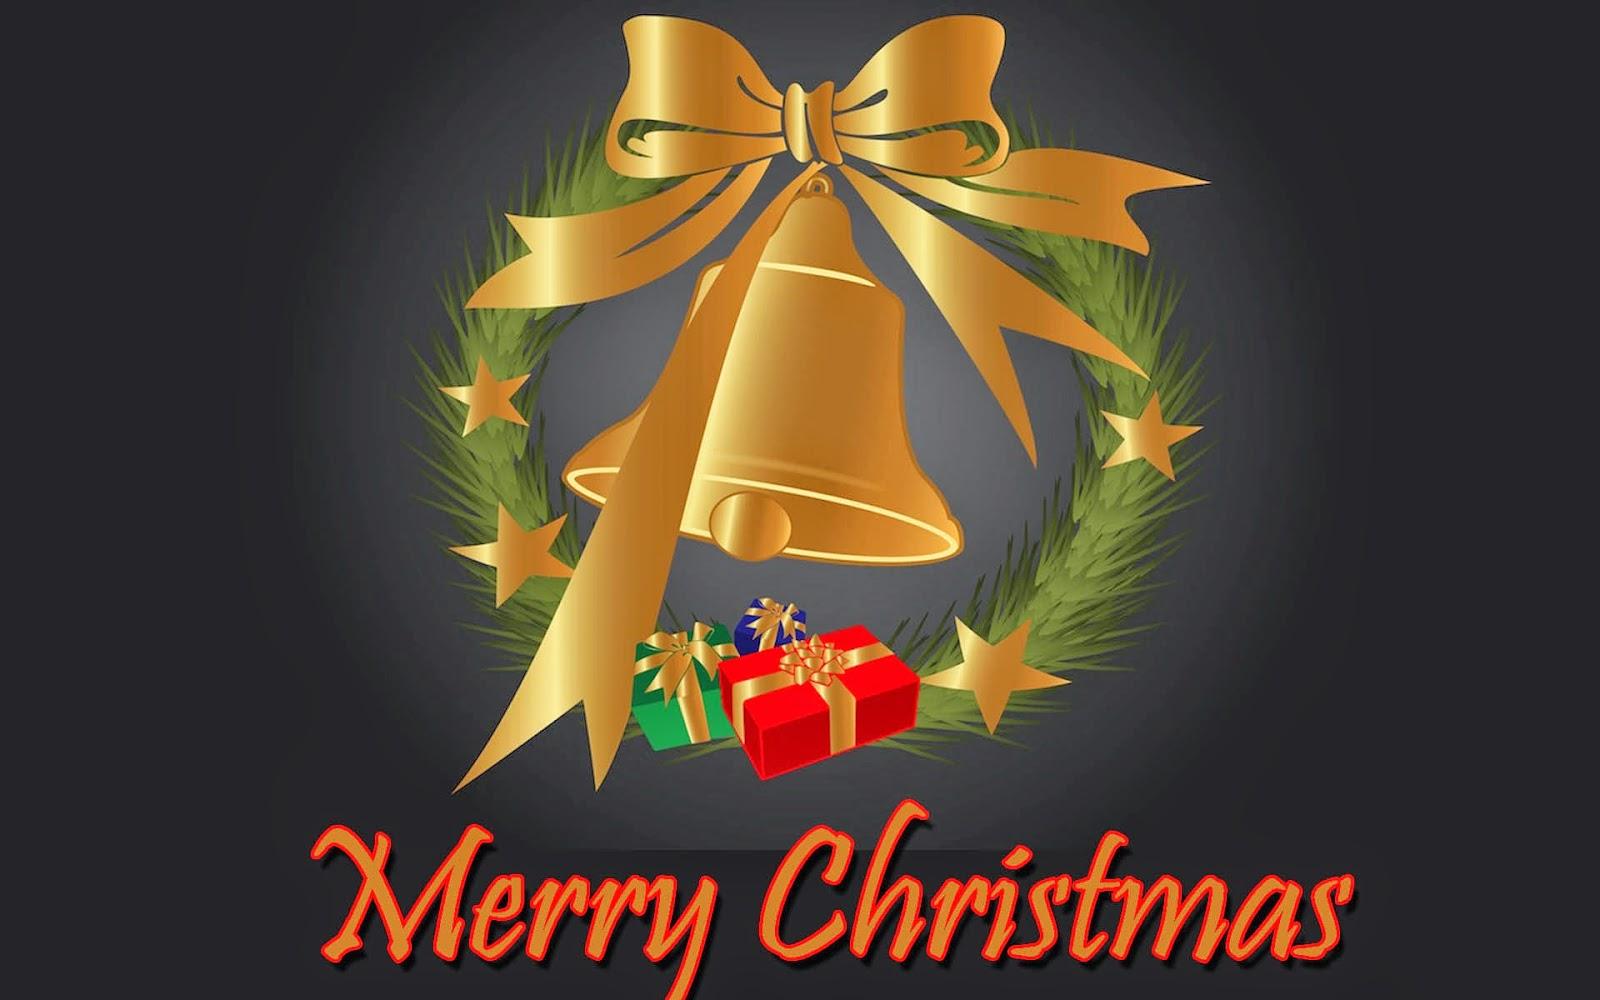 merry-christmas-desktop-background-wallpaper